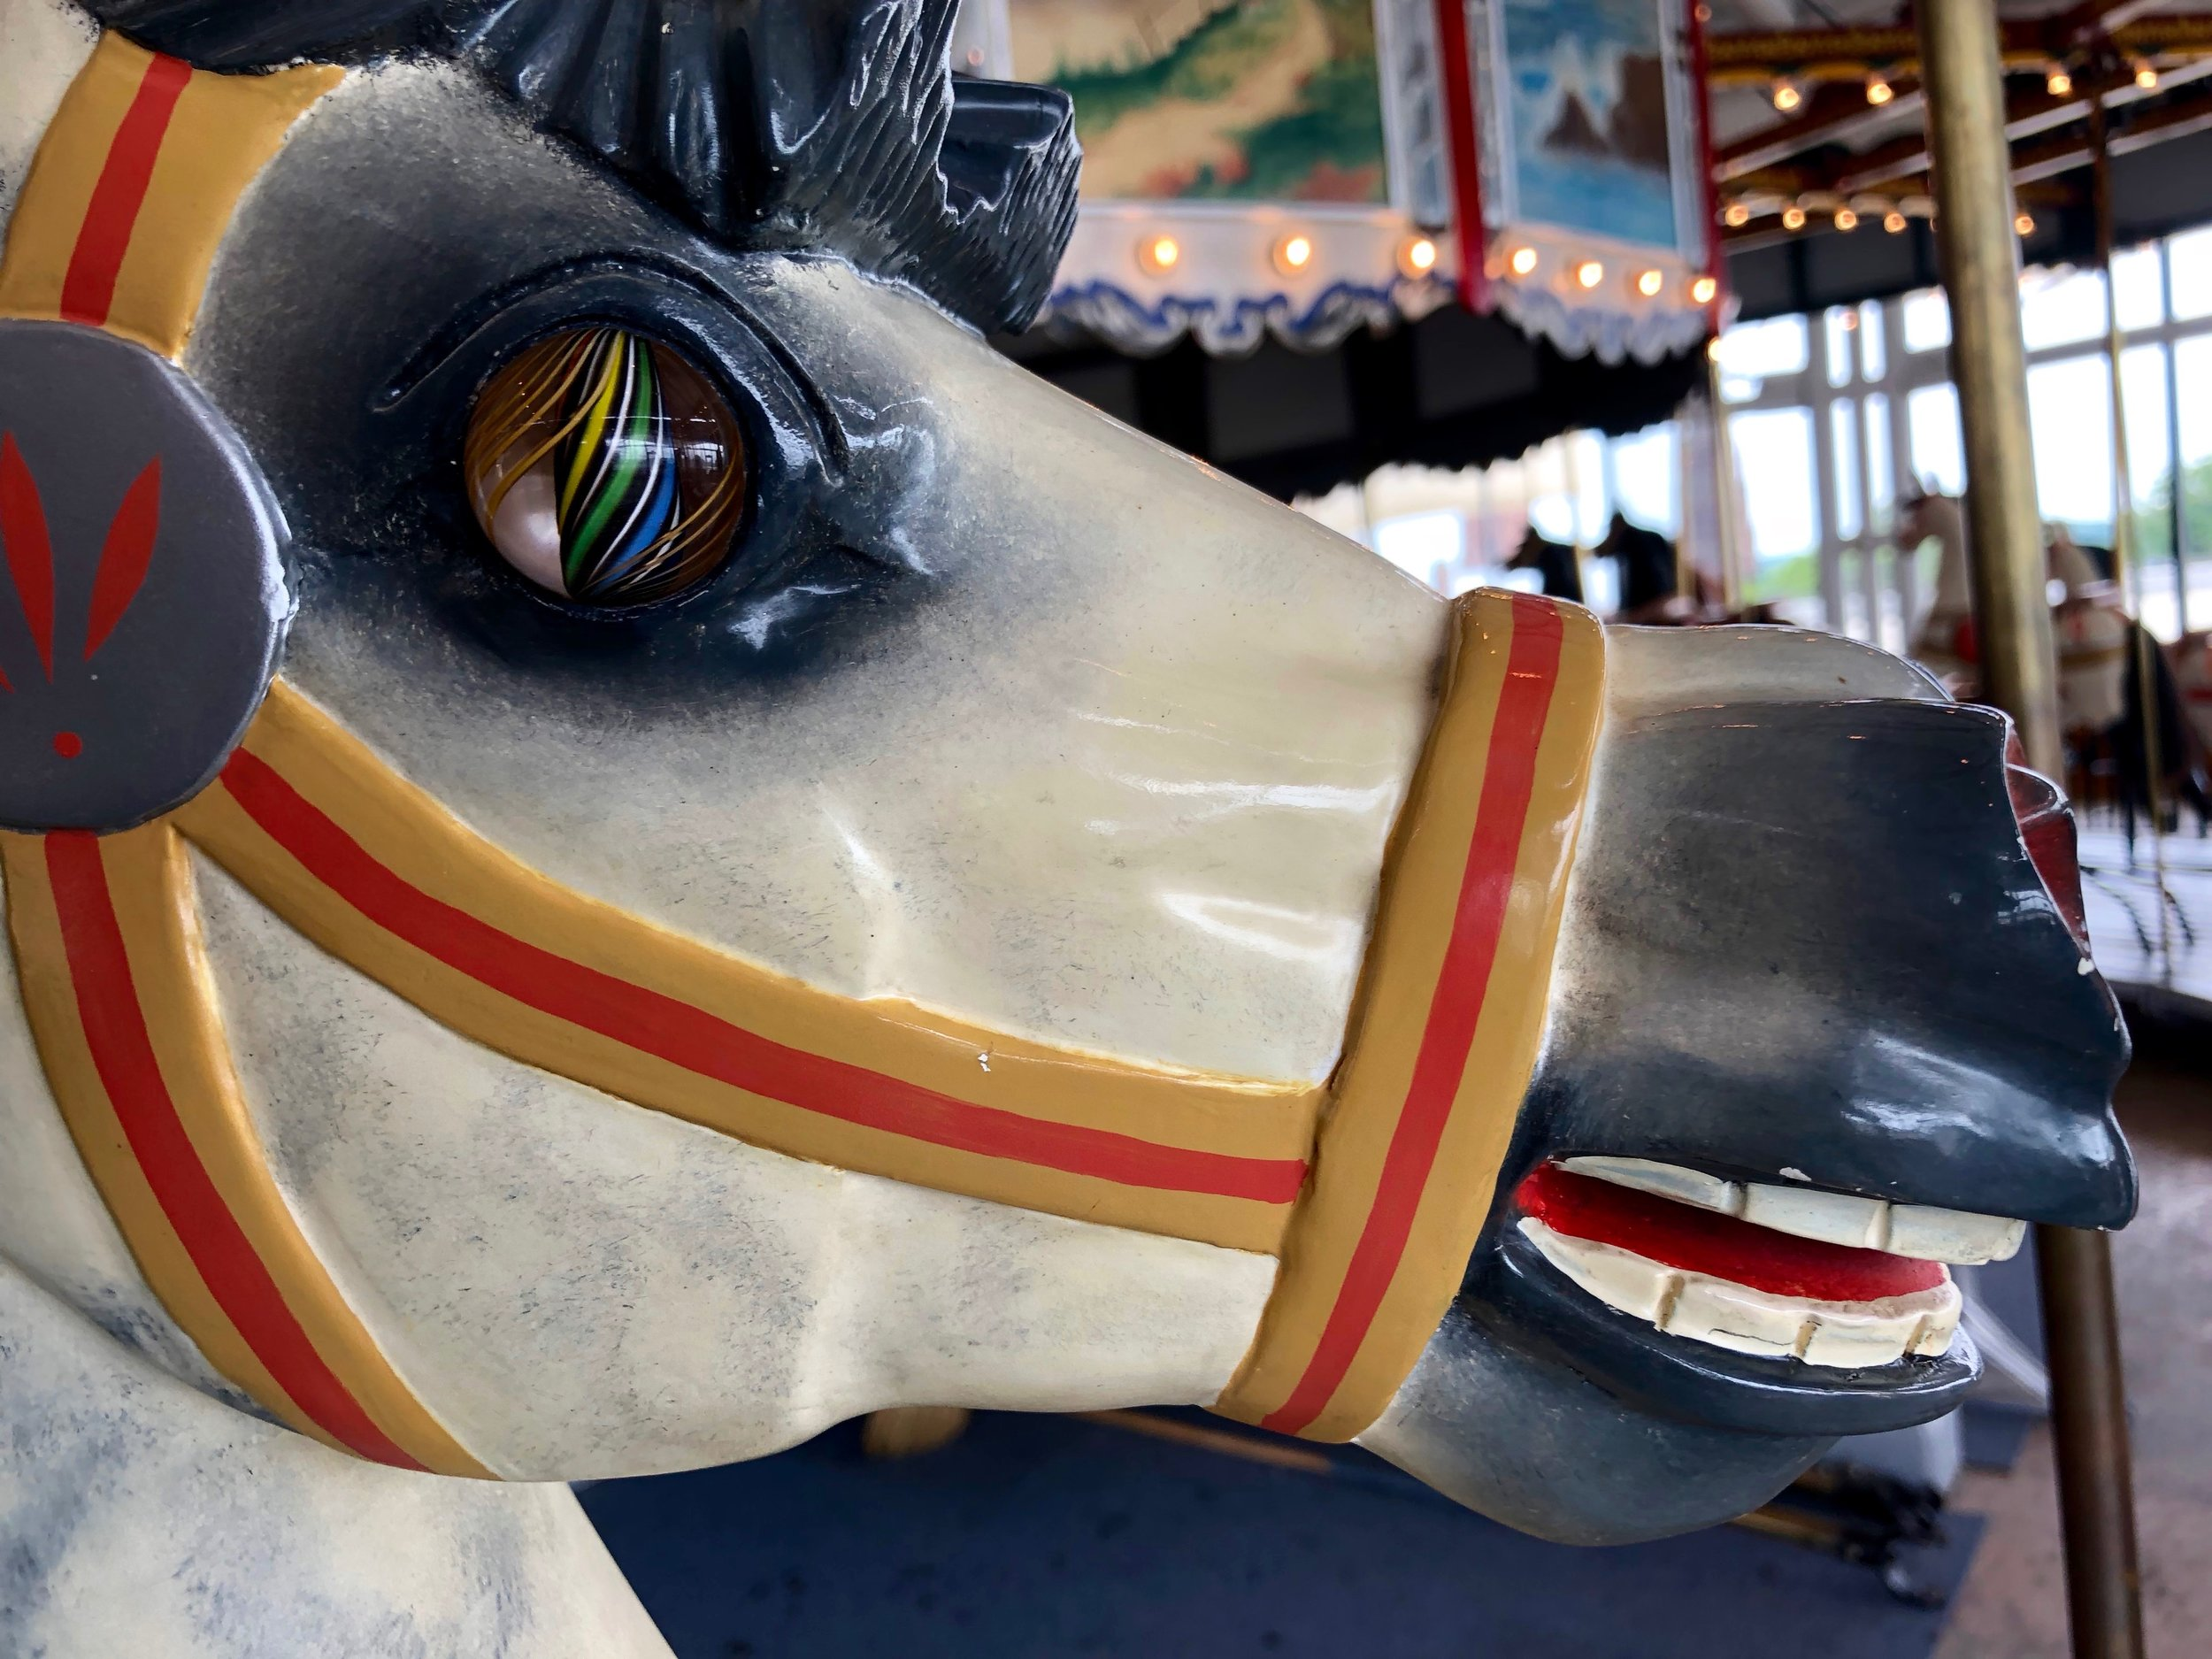 Marble-eyed carousel horse